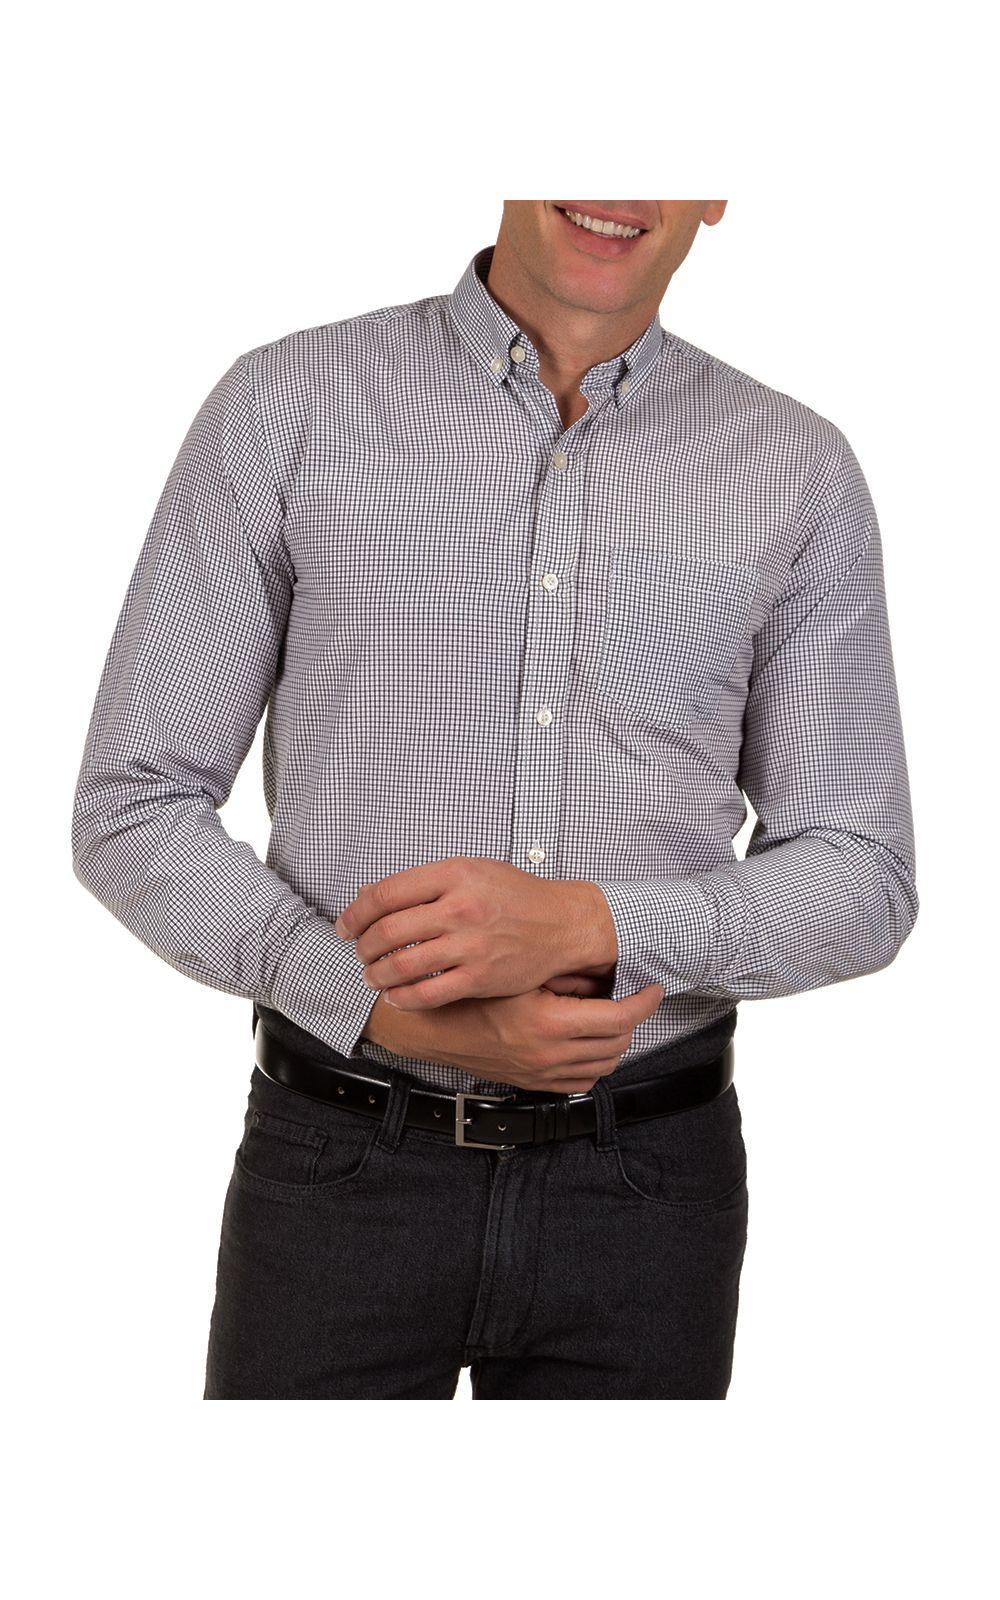 Foto 1 - Camisa Social Masculina Preto Xadrez